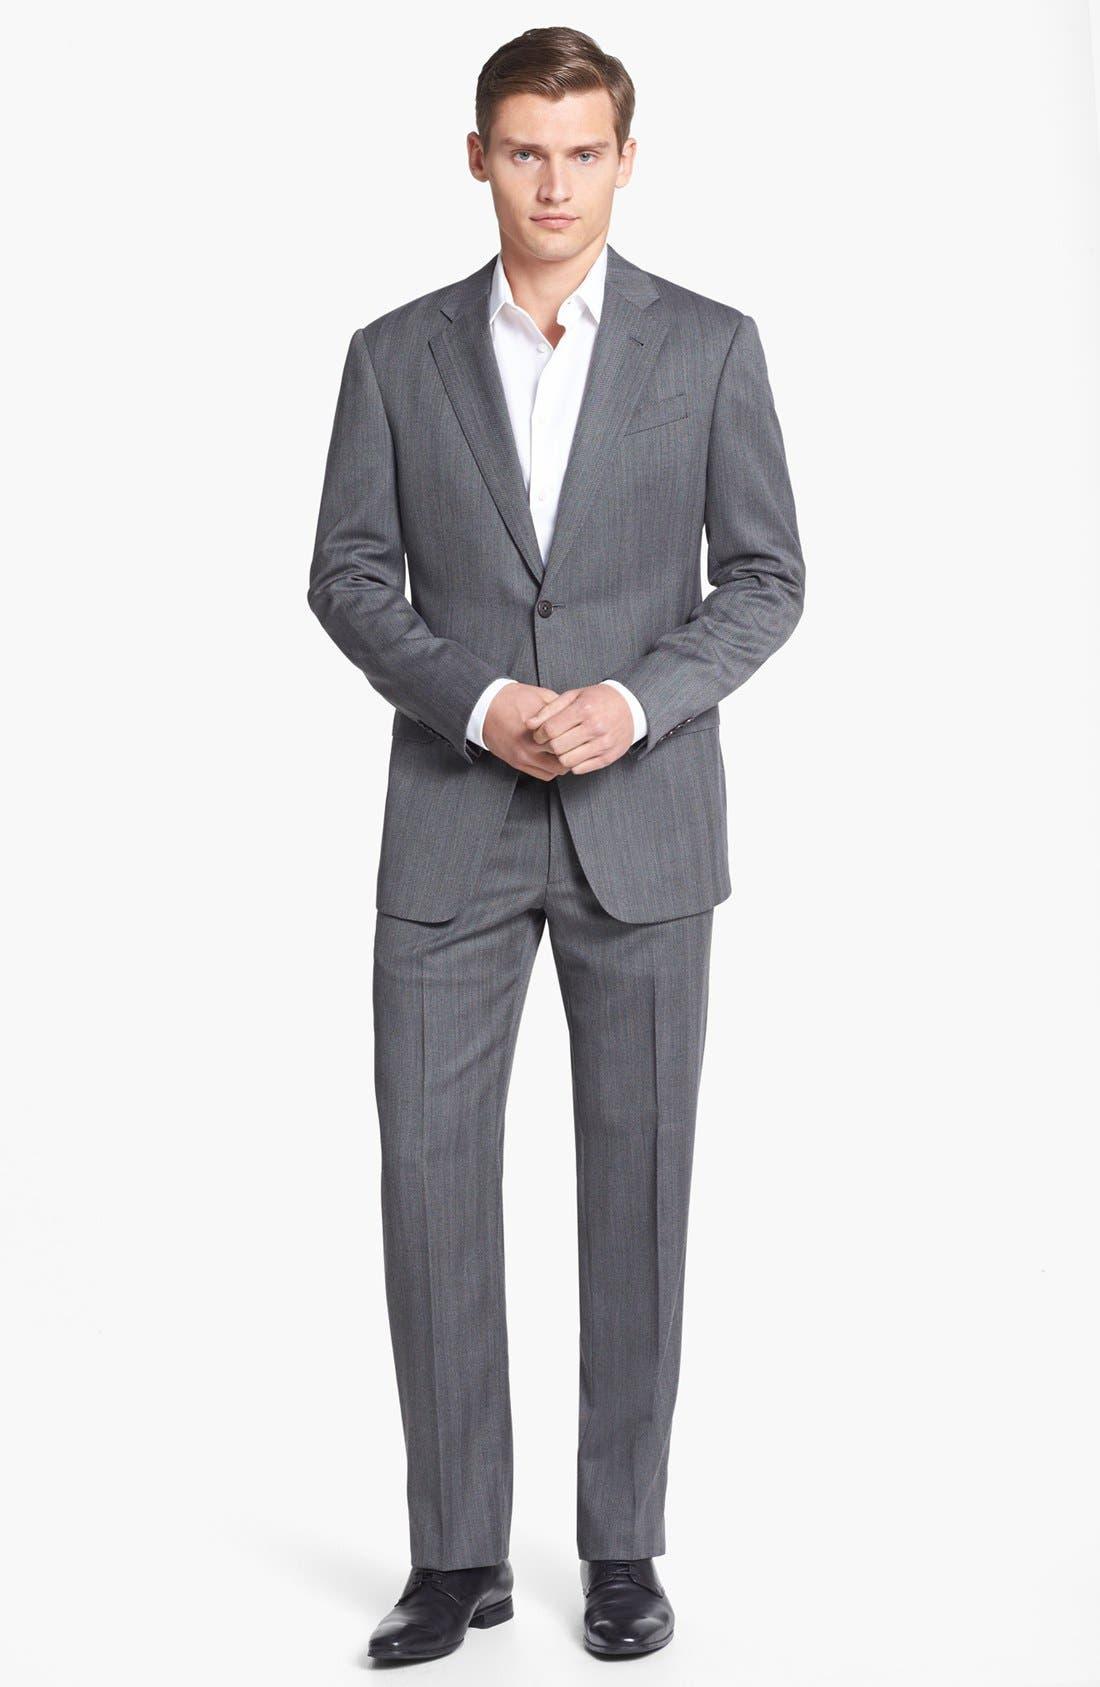 Main Image - Armani Collezioni 'Giorgio' Grey Herringbone Wool Suit